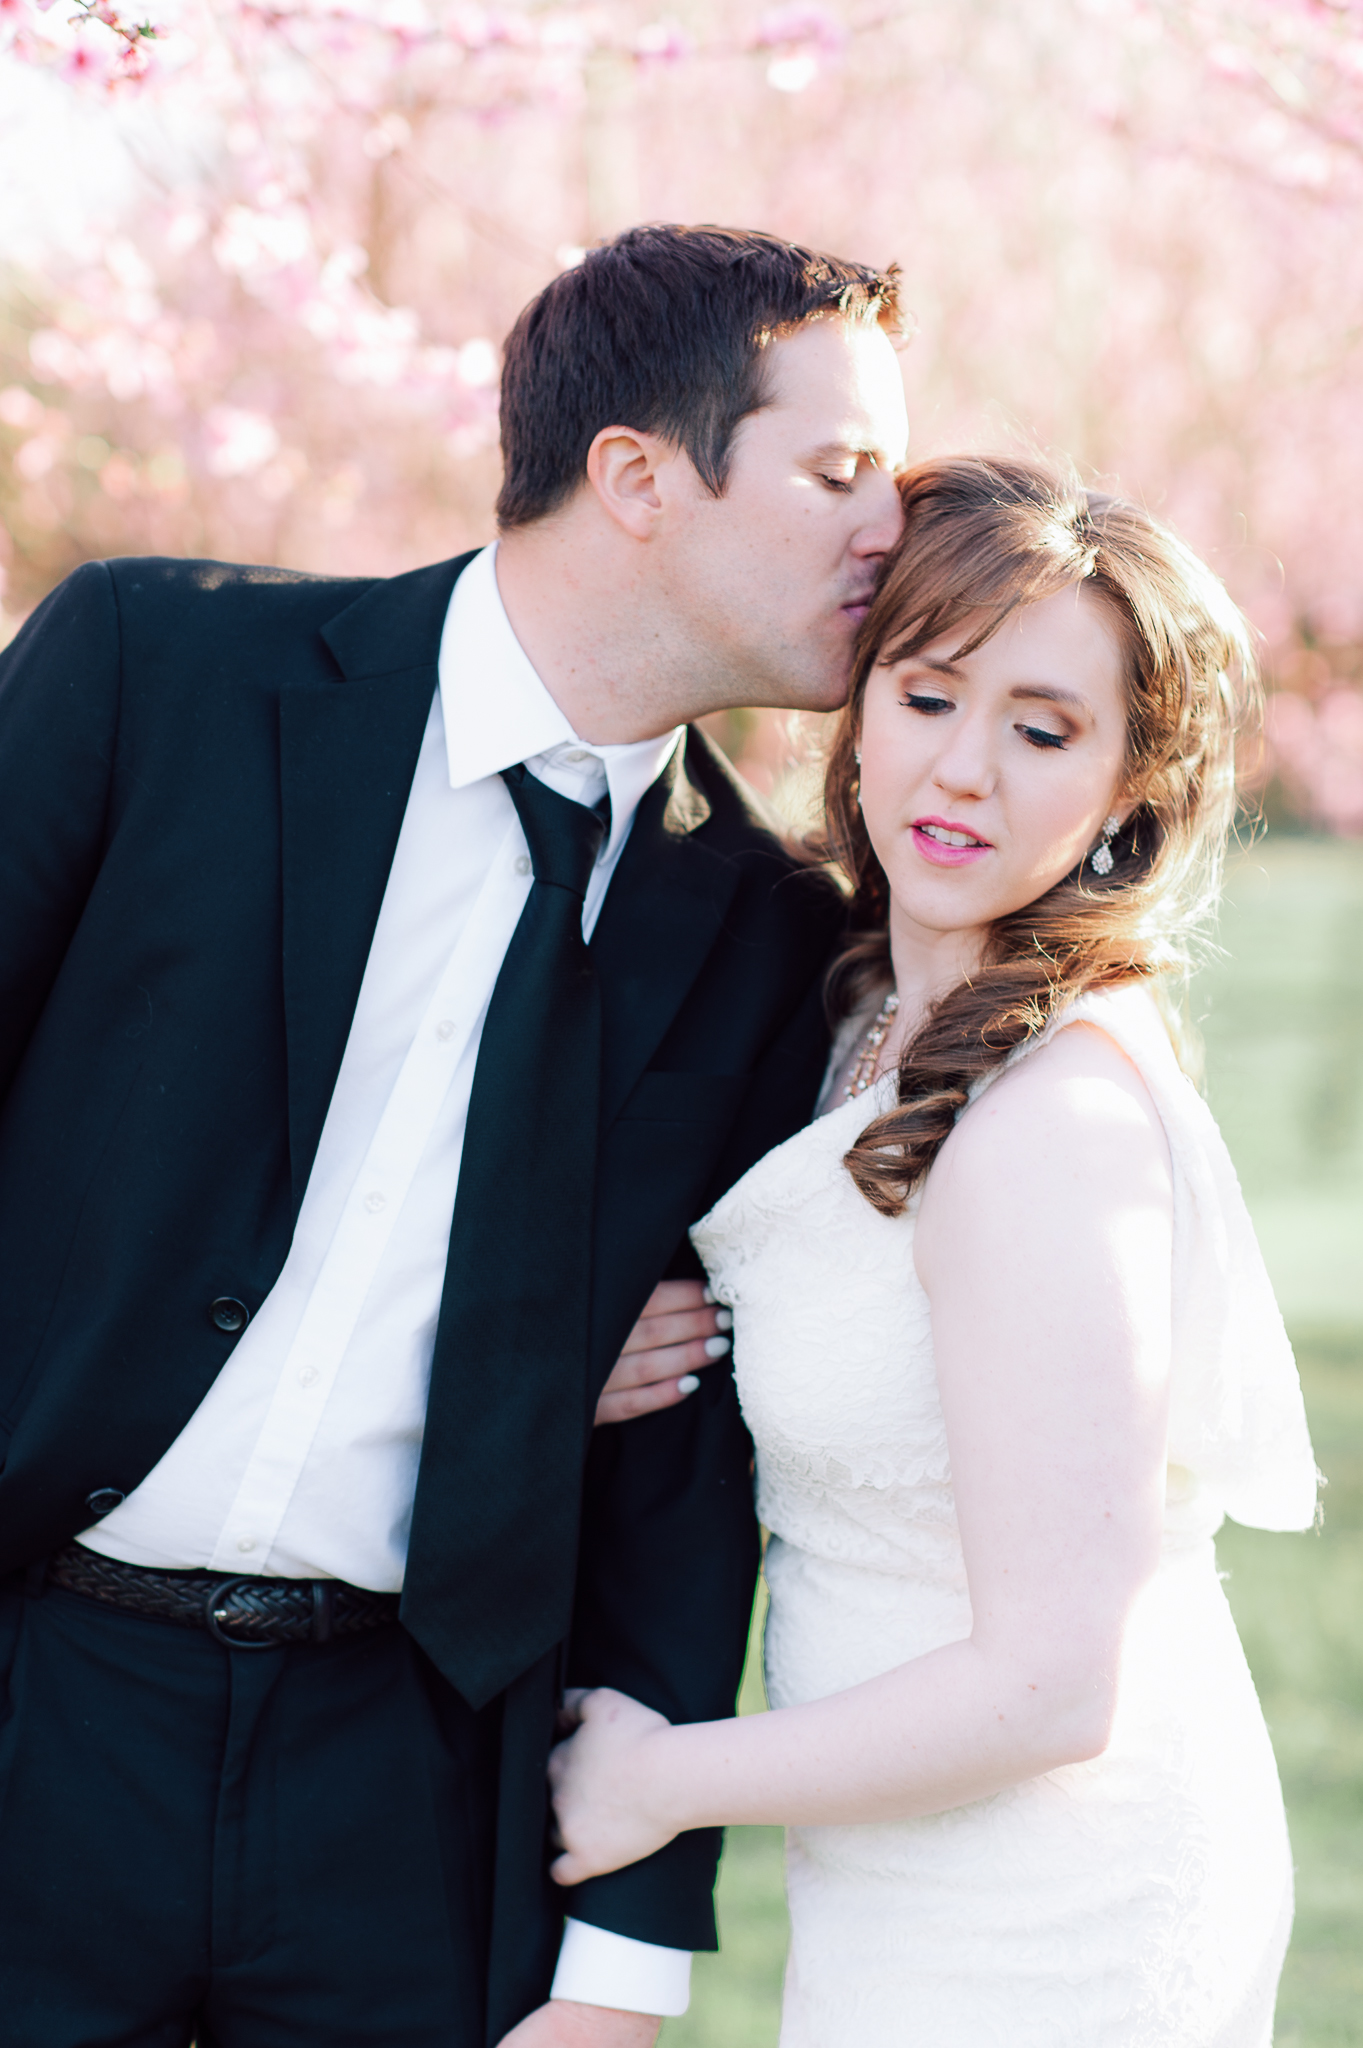 springwedding_cherryblossoms_virginiaphotographer_youseephotography_styledshoot (560).jpg